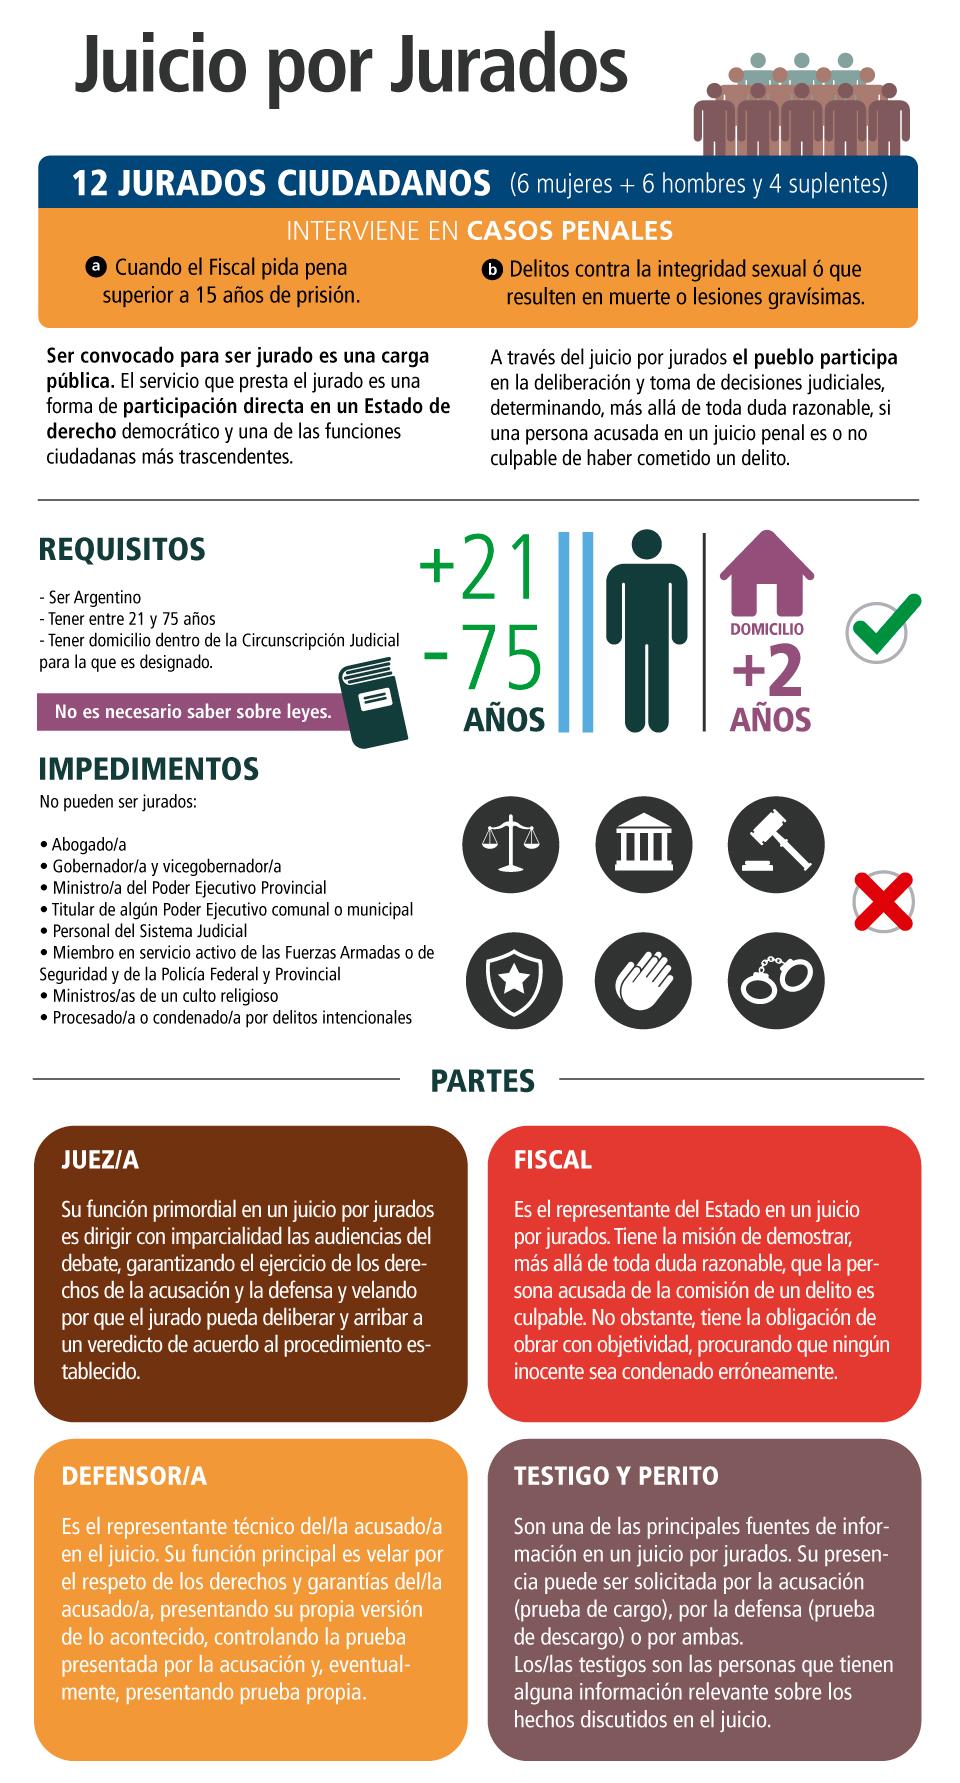 infografia juicio por jurados